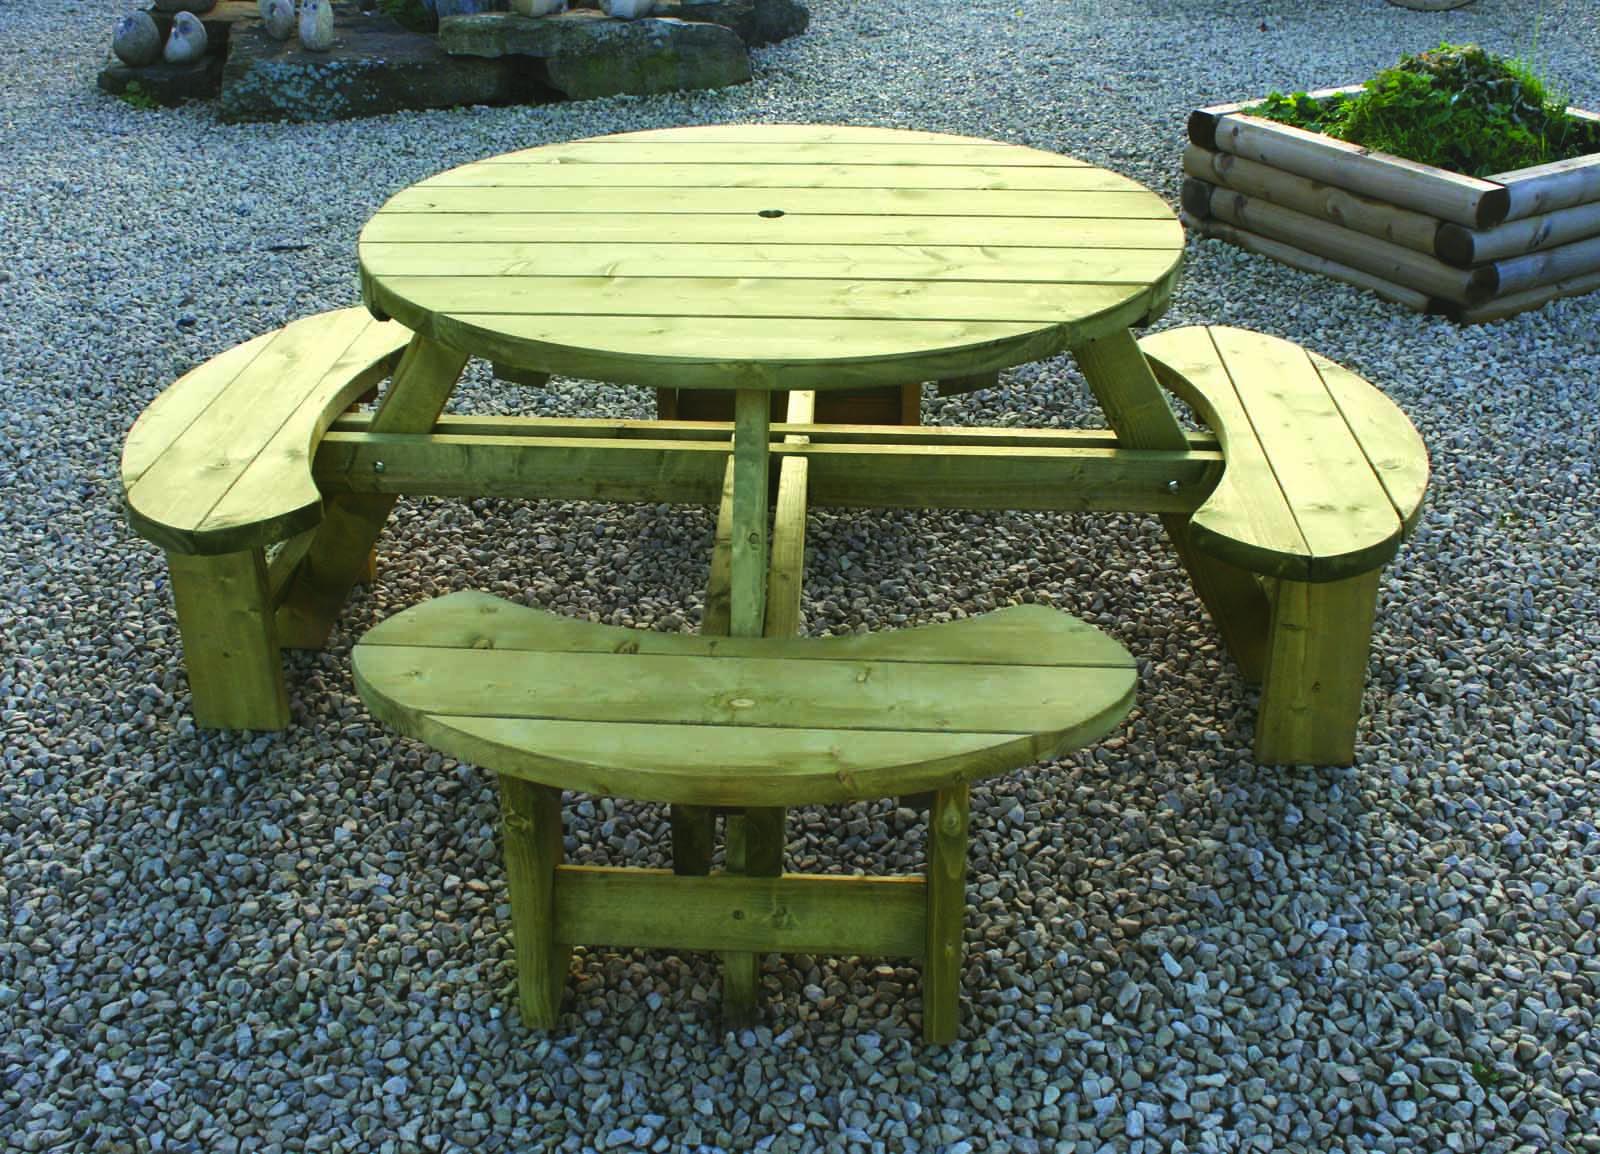 Standard Round Table.Kdm Standard Round Table Bench Seat